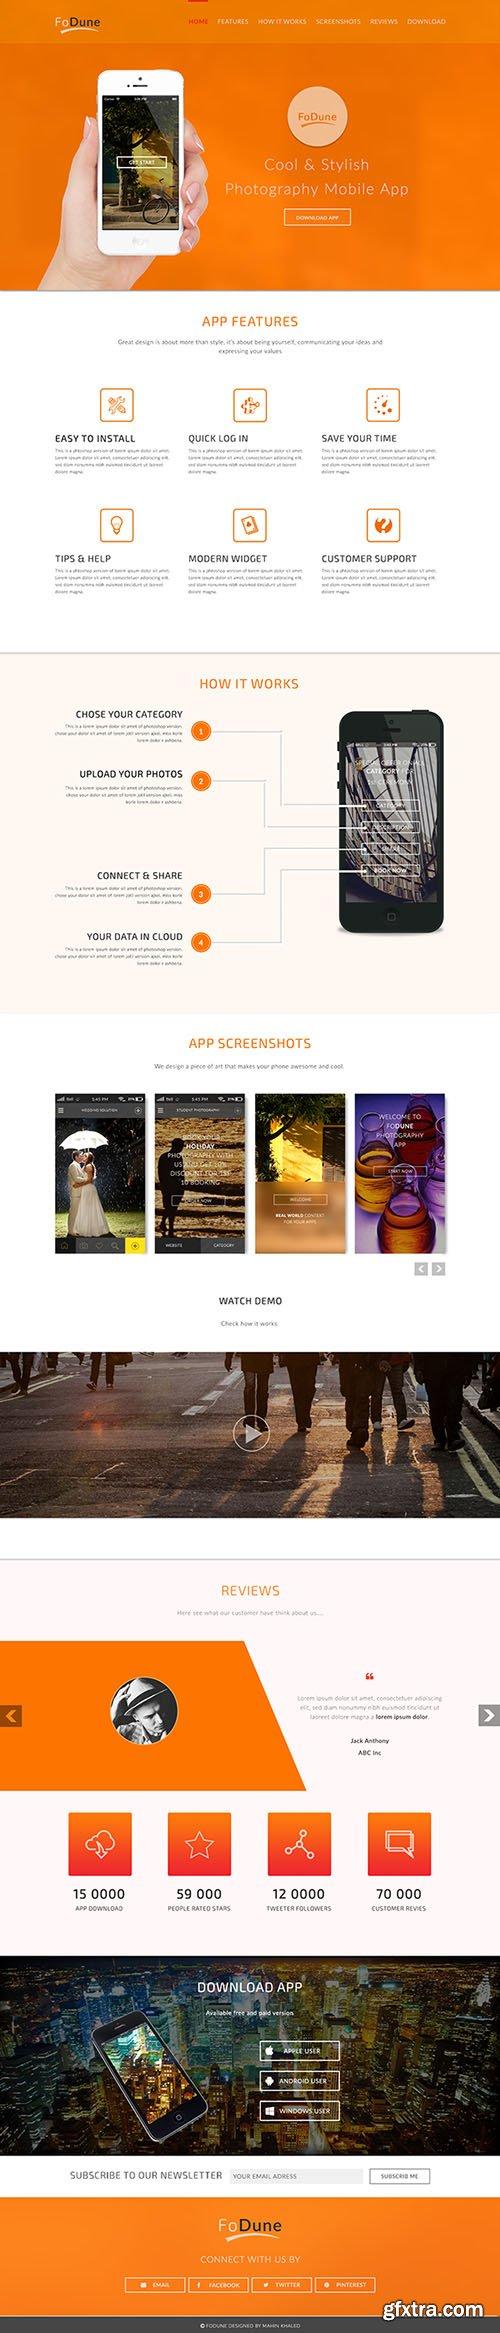 PSD Web Template - App Landing Page - Orange Color Style